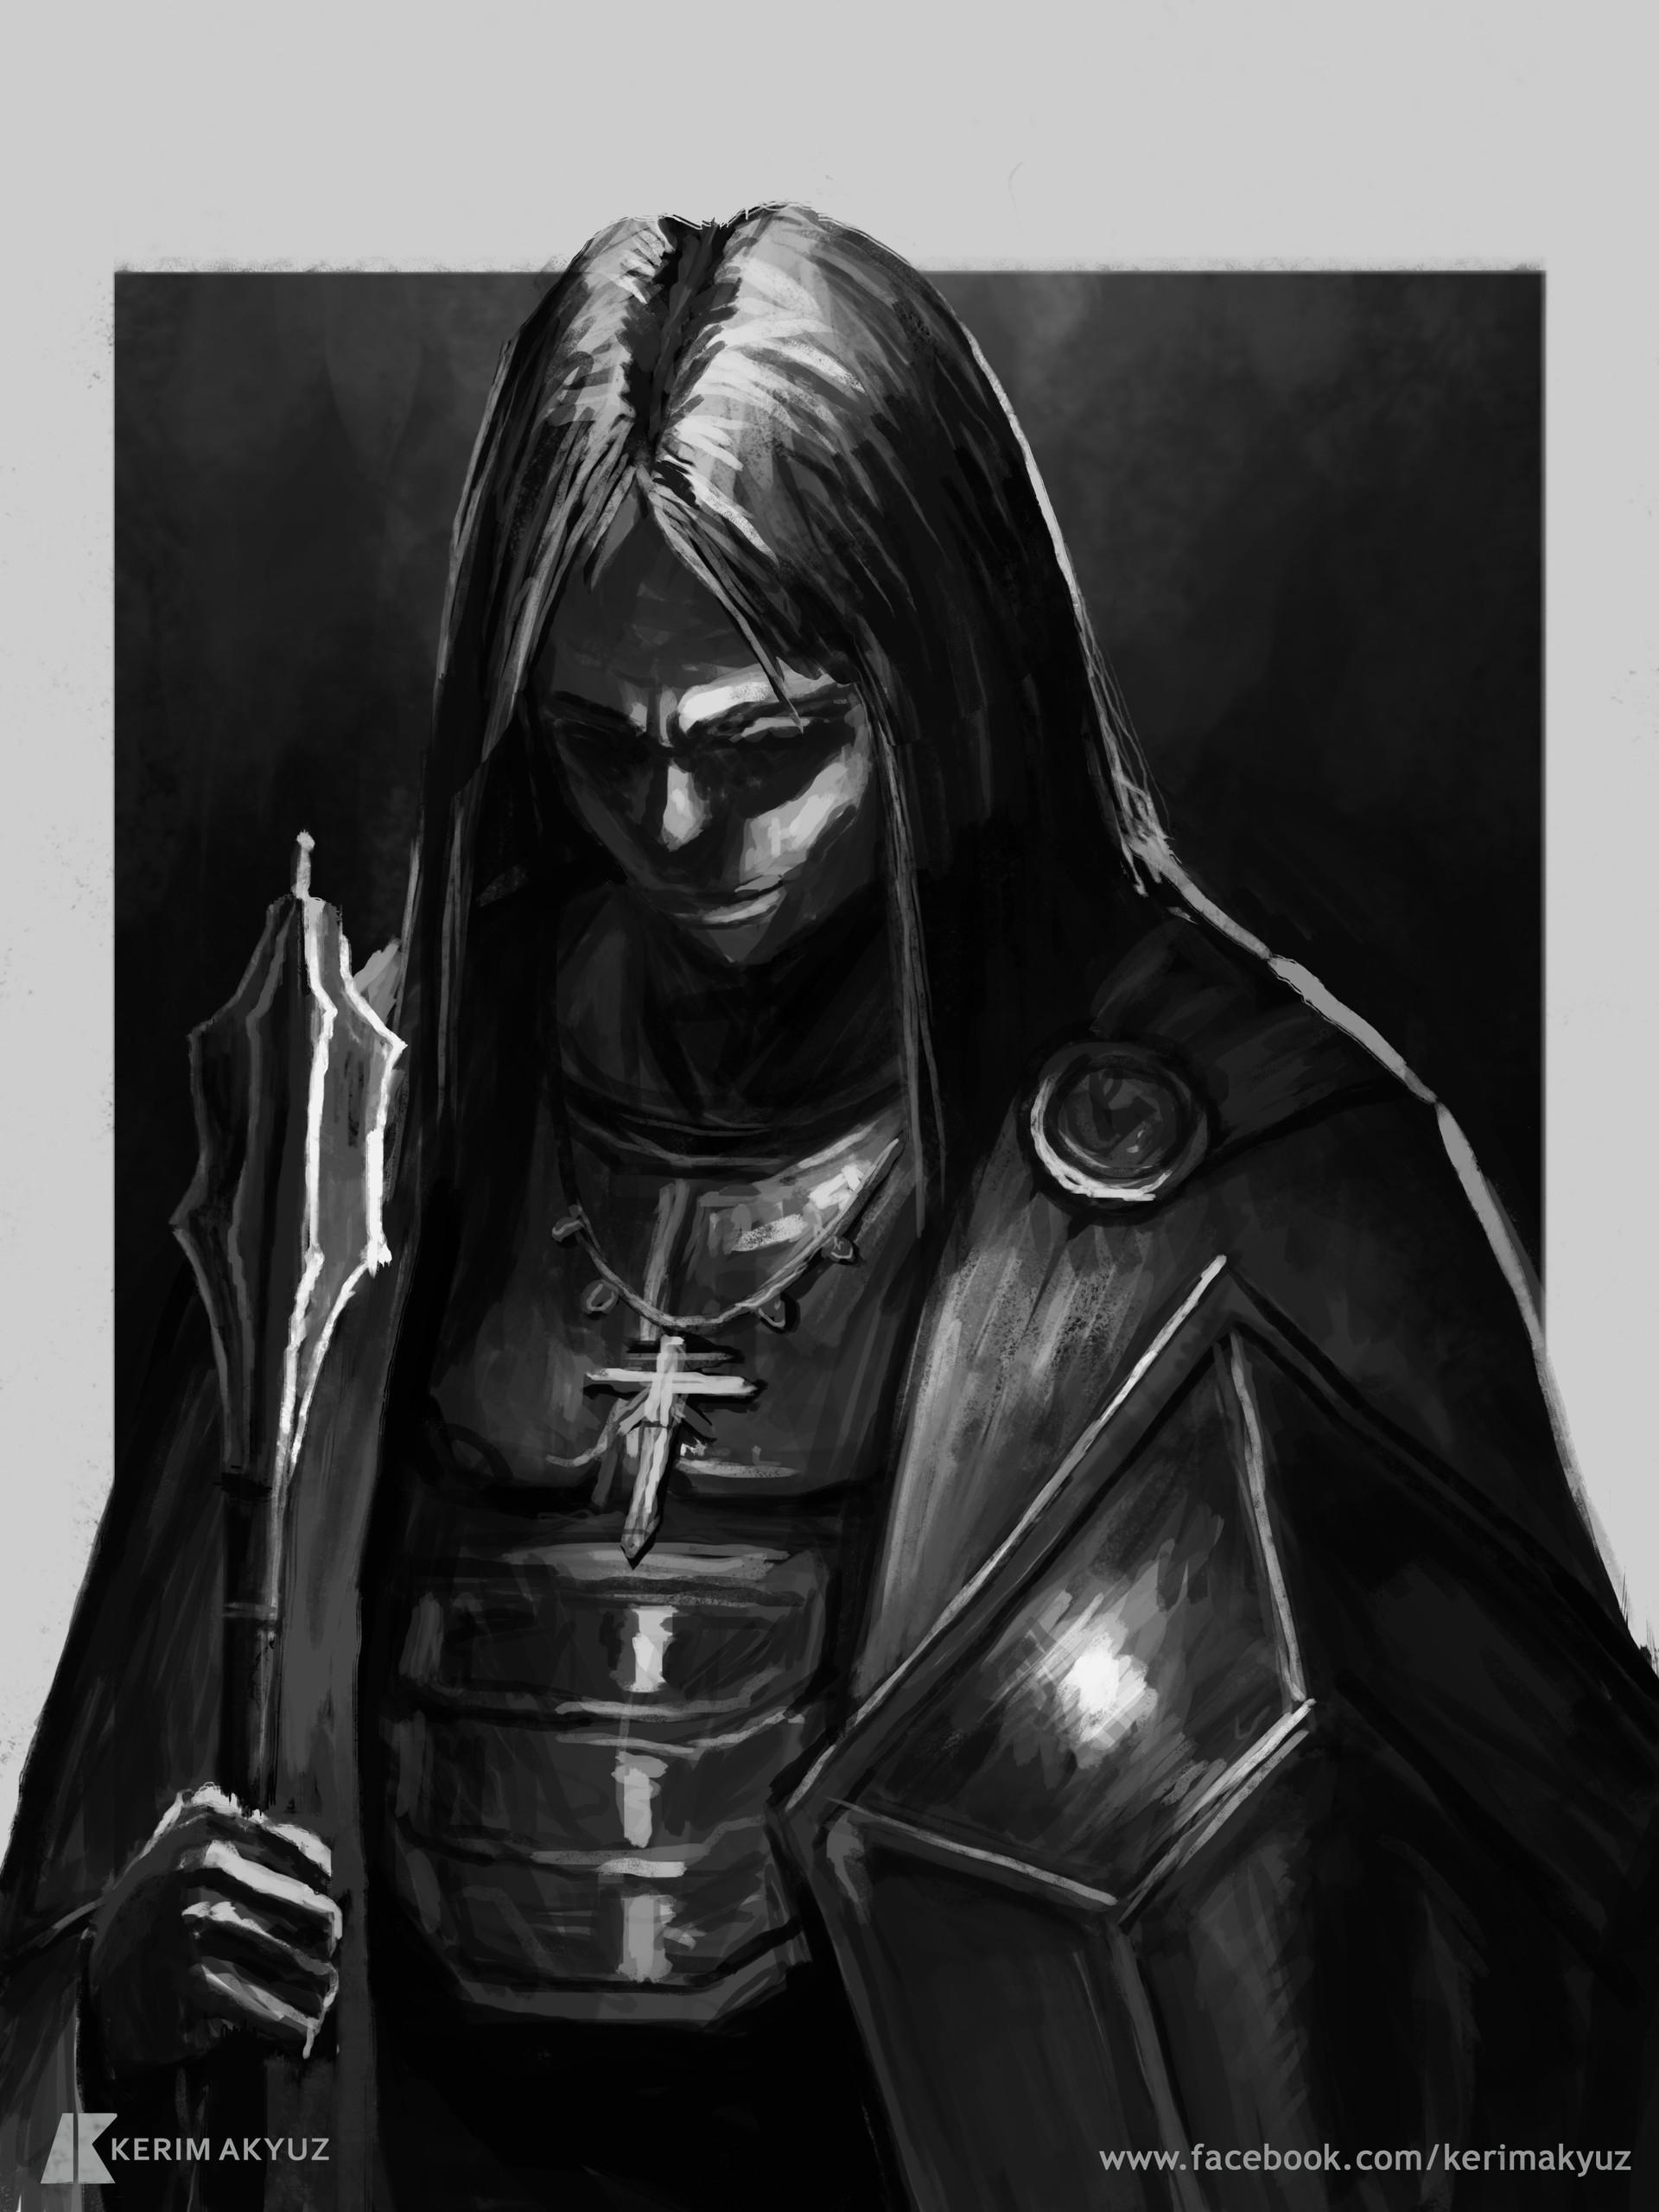 Kerim akyuz 335 cleric